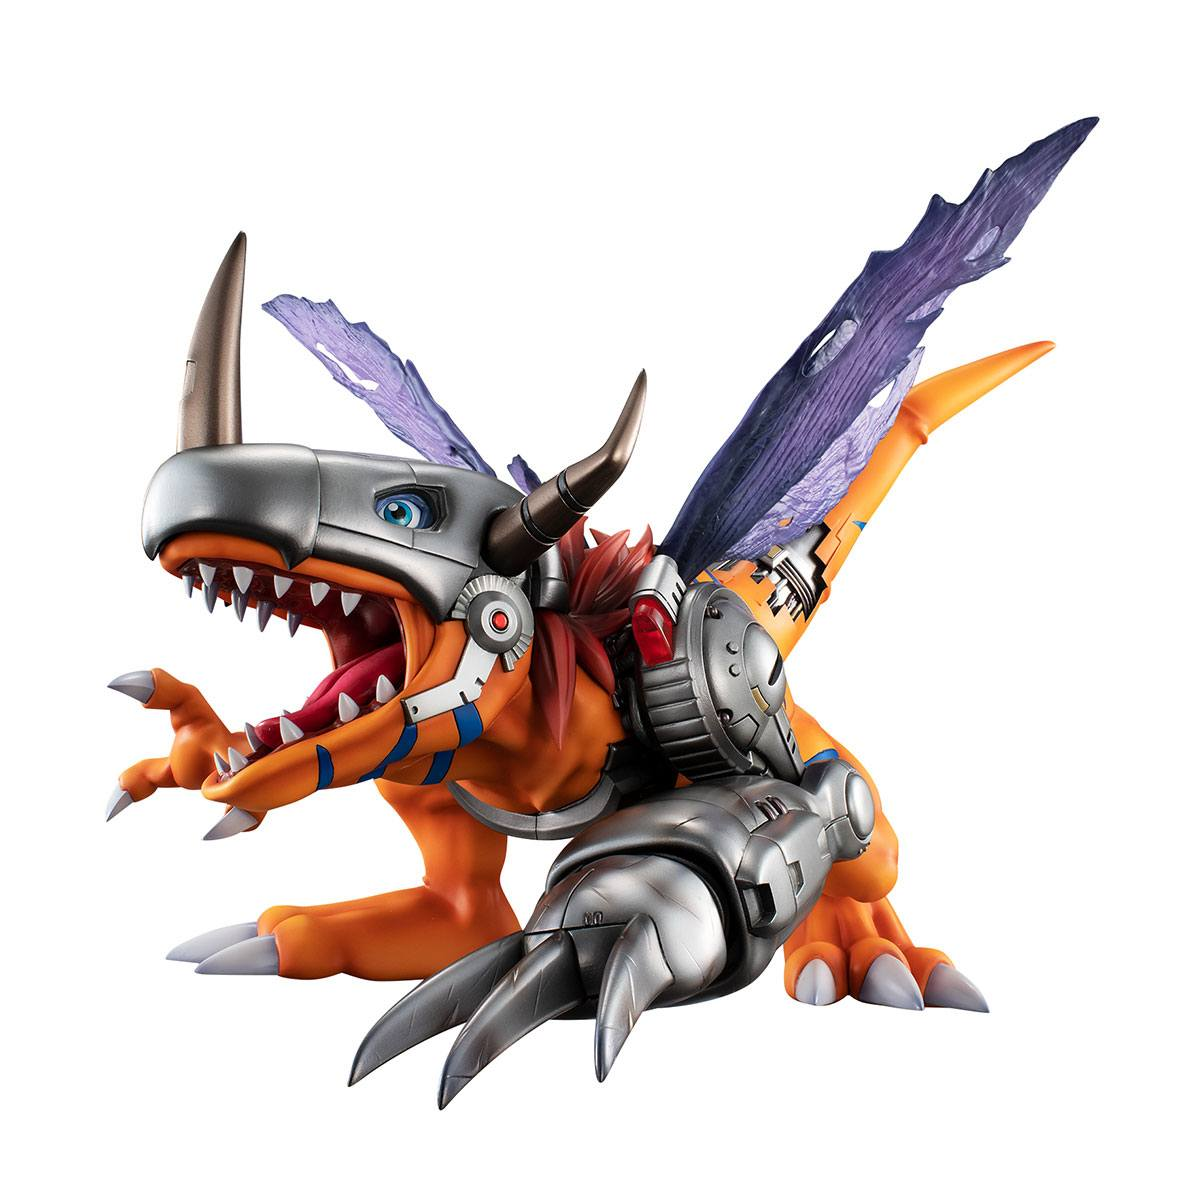 Digimon Adventure Precious G.E.M. Series PVC Statue Metal Greymon 22 cm